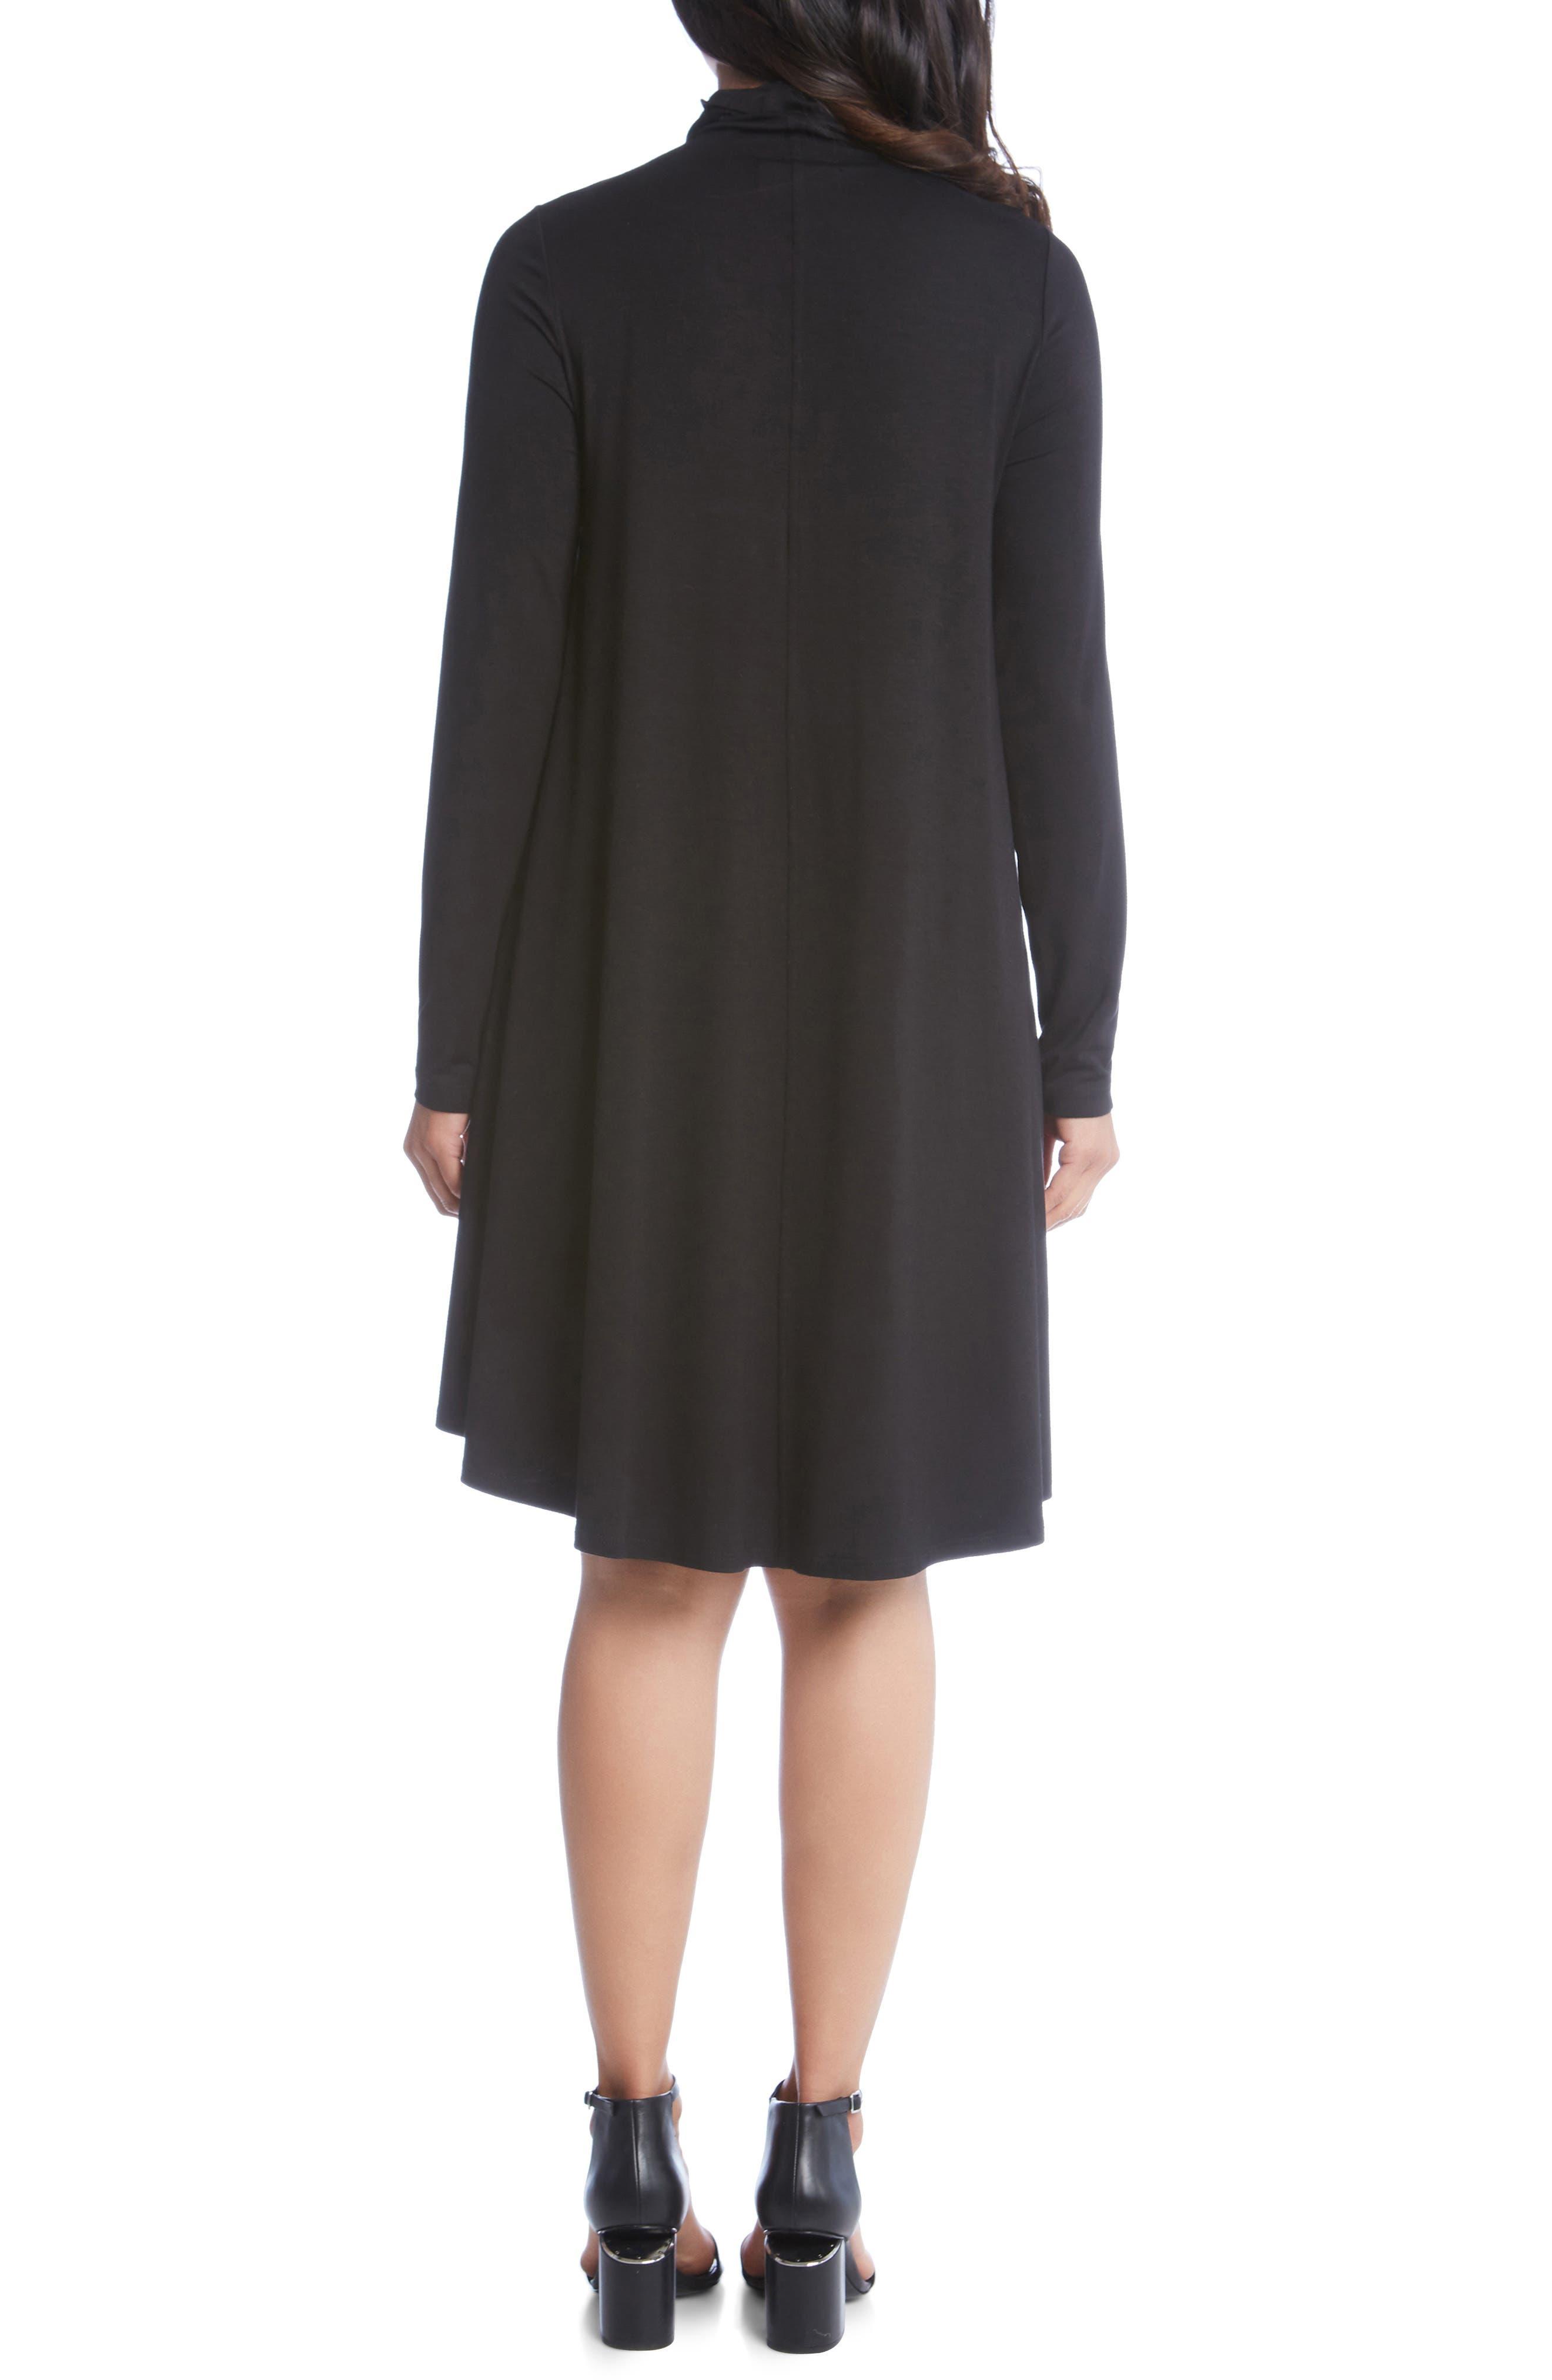 KAREN KANE, Maggie Turtleneck Trapeze Dress, Alternate thumbnail 2, color, BLACK